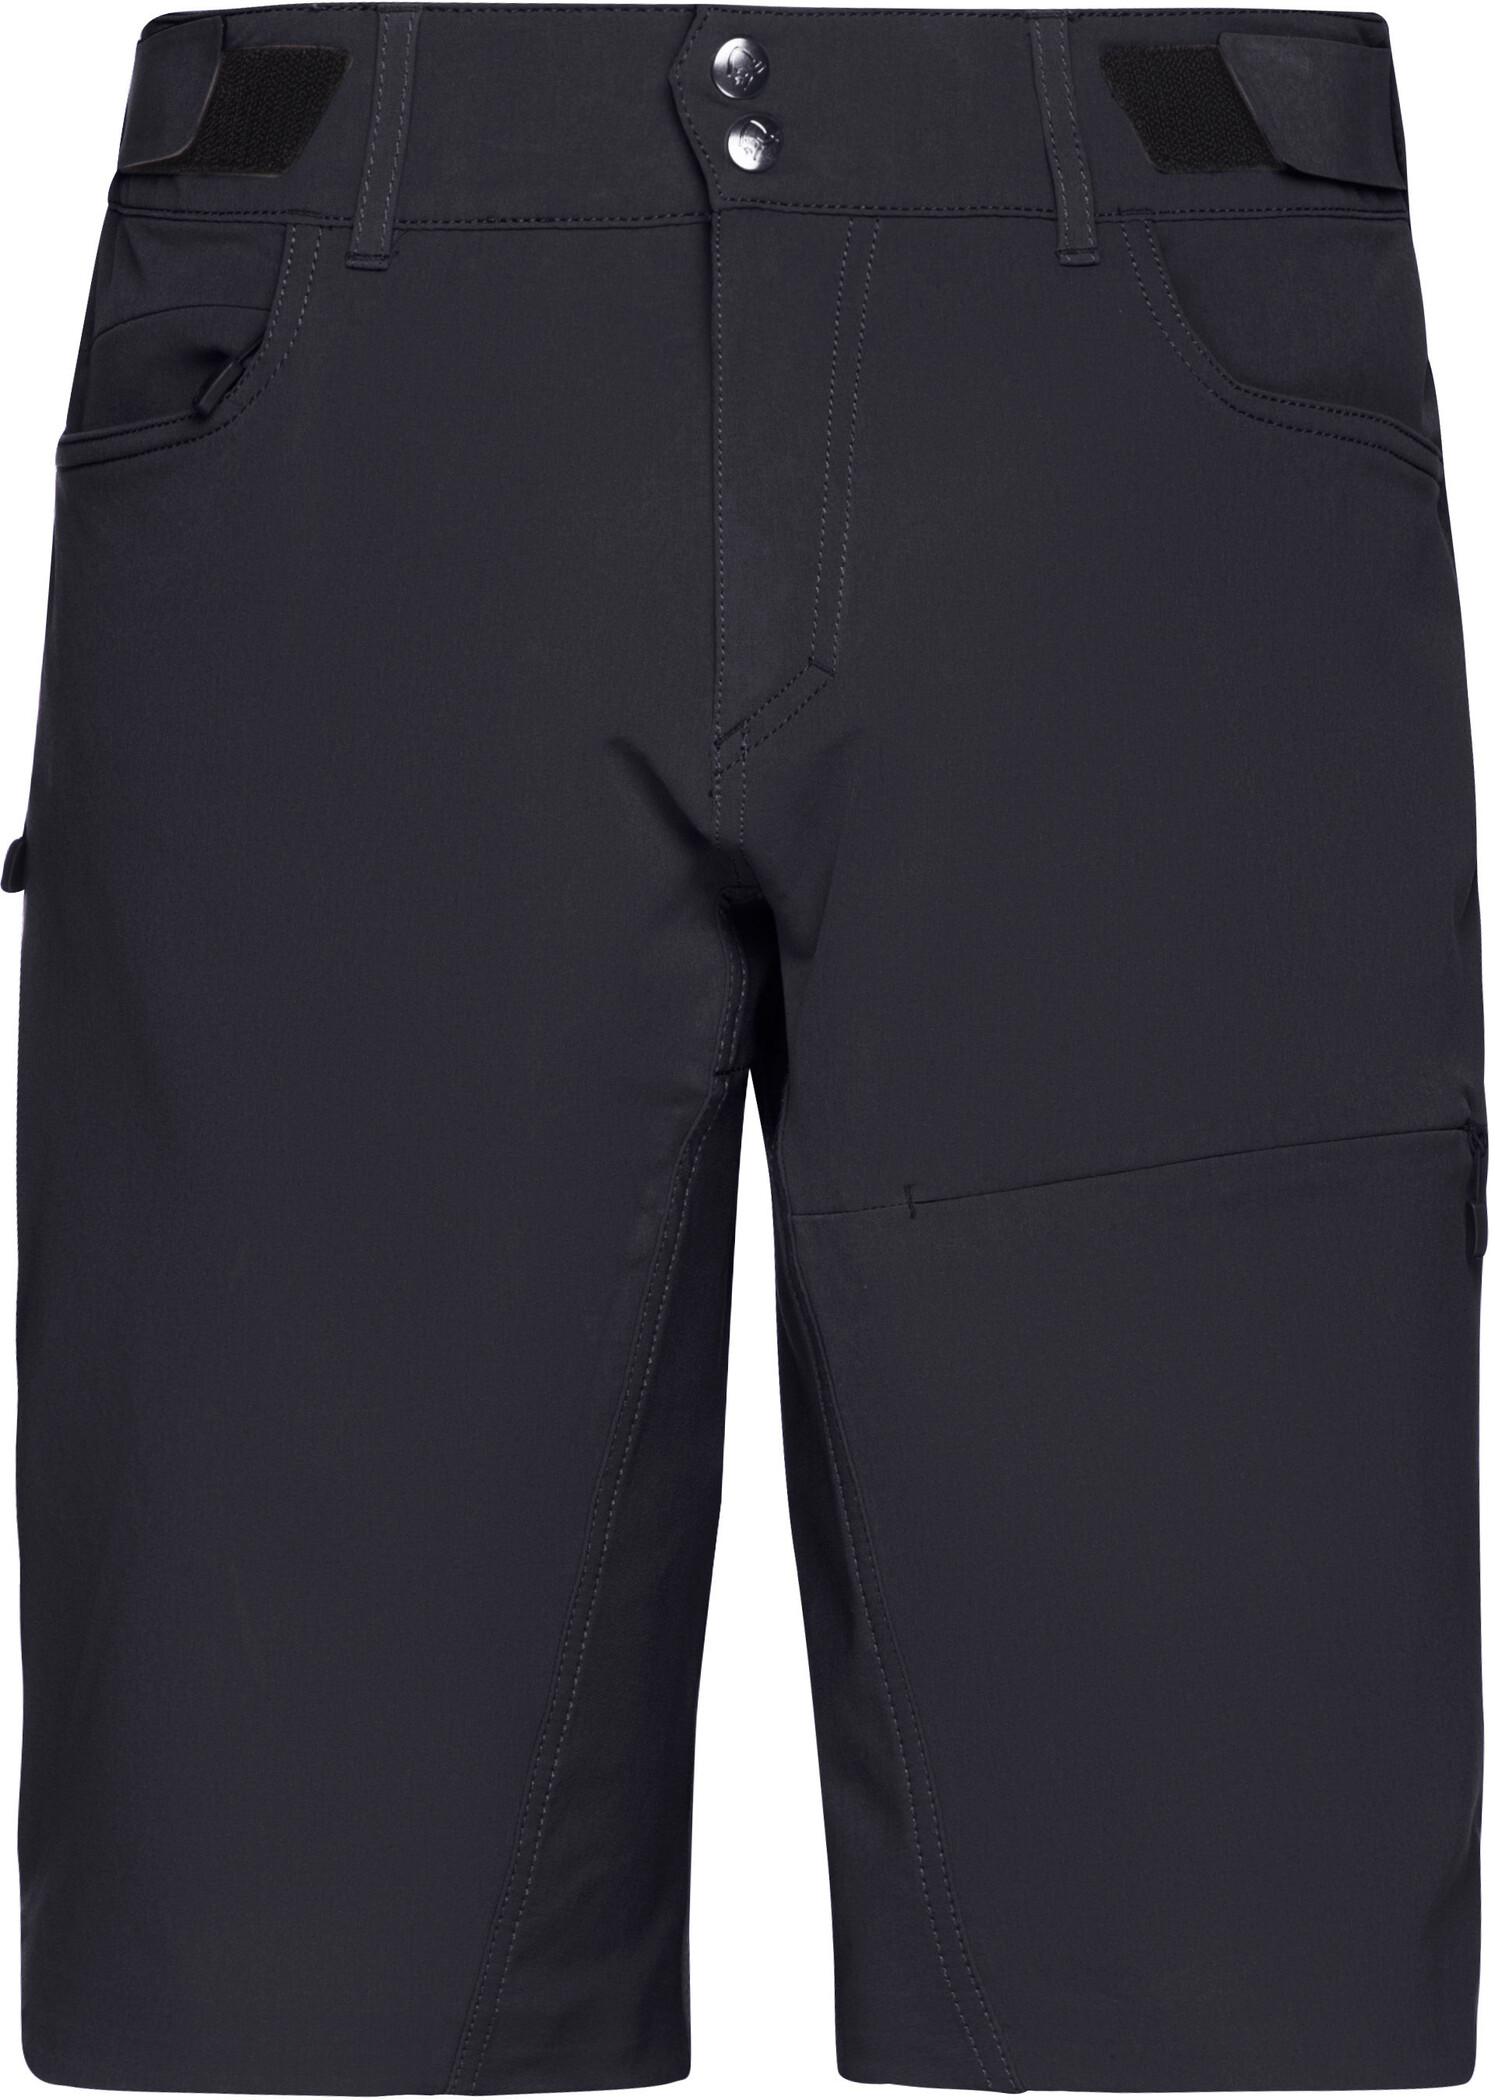 Norrøna Skibotn Flex1 Lightweight Shorts Herrer, caviar (2019)   Trousers